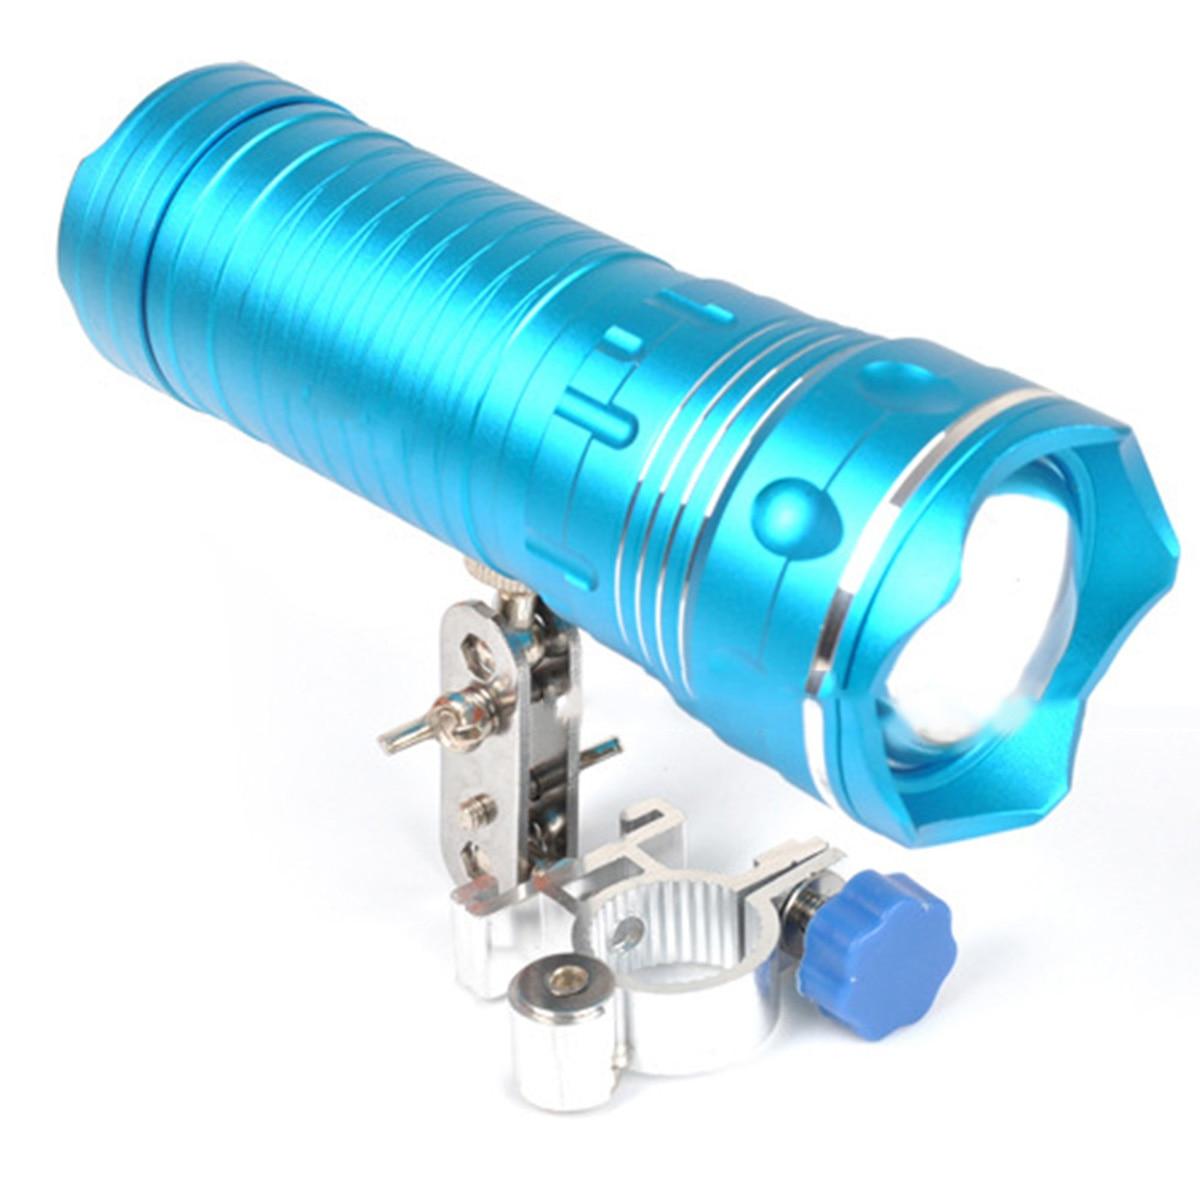 Silla de pesca ajustable de aleación de aluminio Universal para exteriores, soporte de soporte para paraguas, soporte de luz de pesca nocturna de aluminio